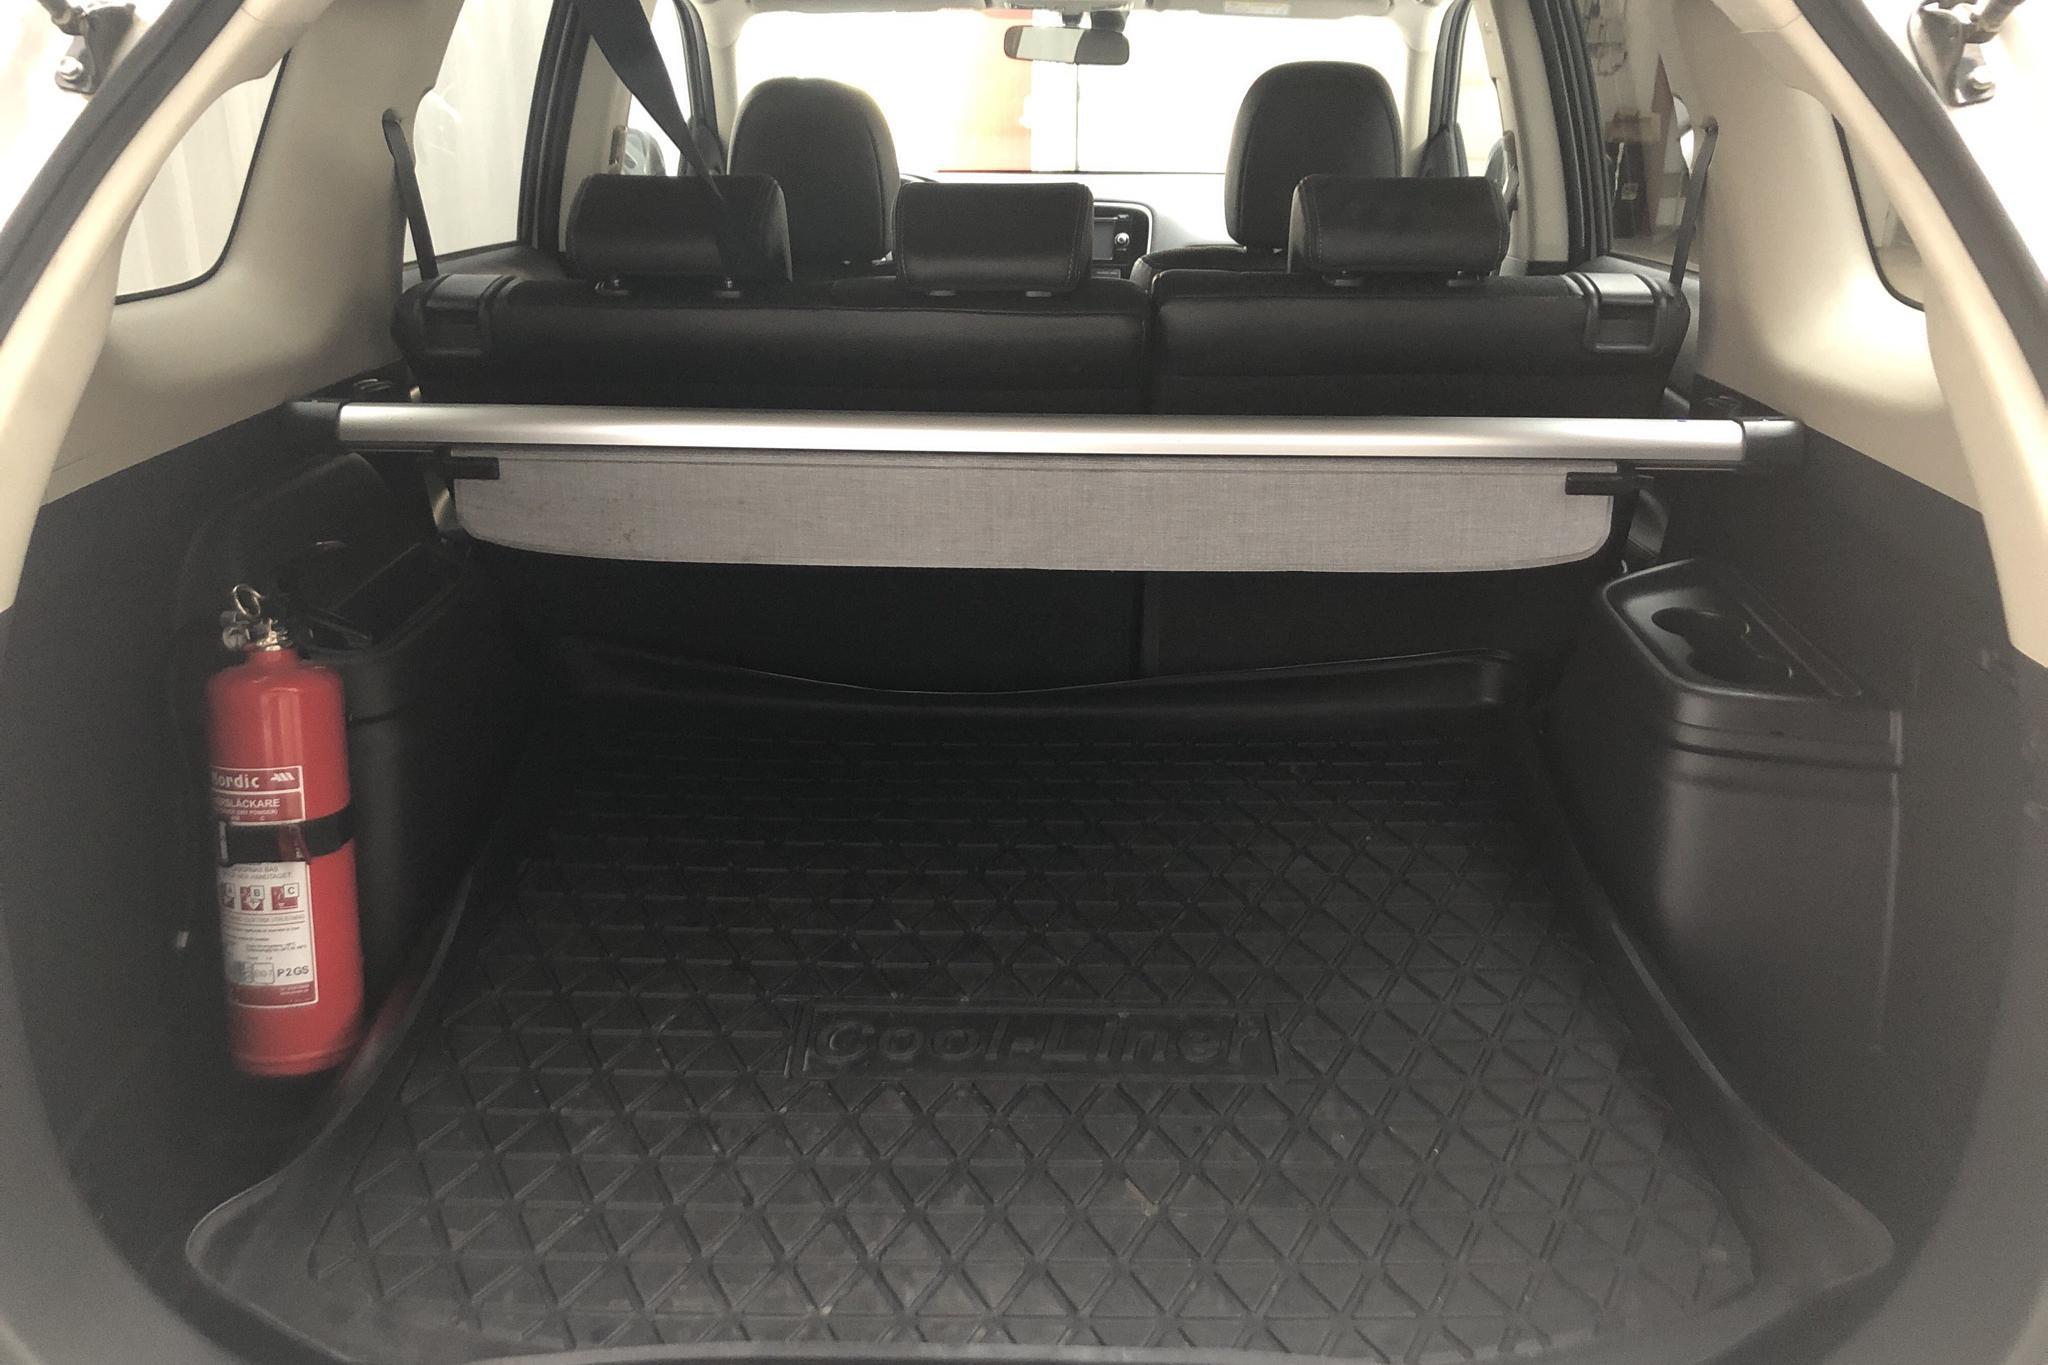 Mitsubishi Outlander 2.0 Plug-in Hybrid 4WD (121hk) - 156 710 km - Automatic - white - 2015